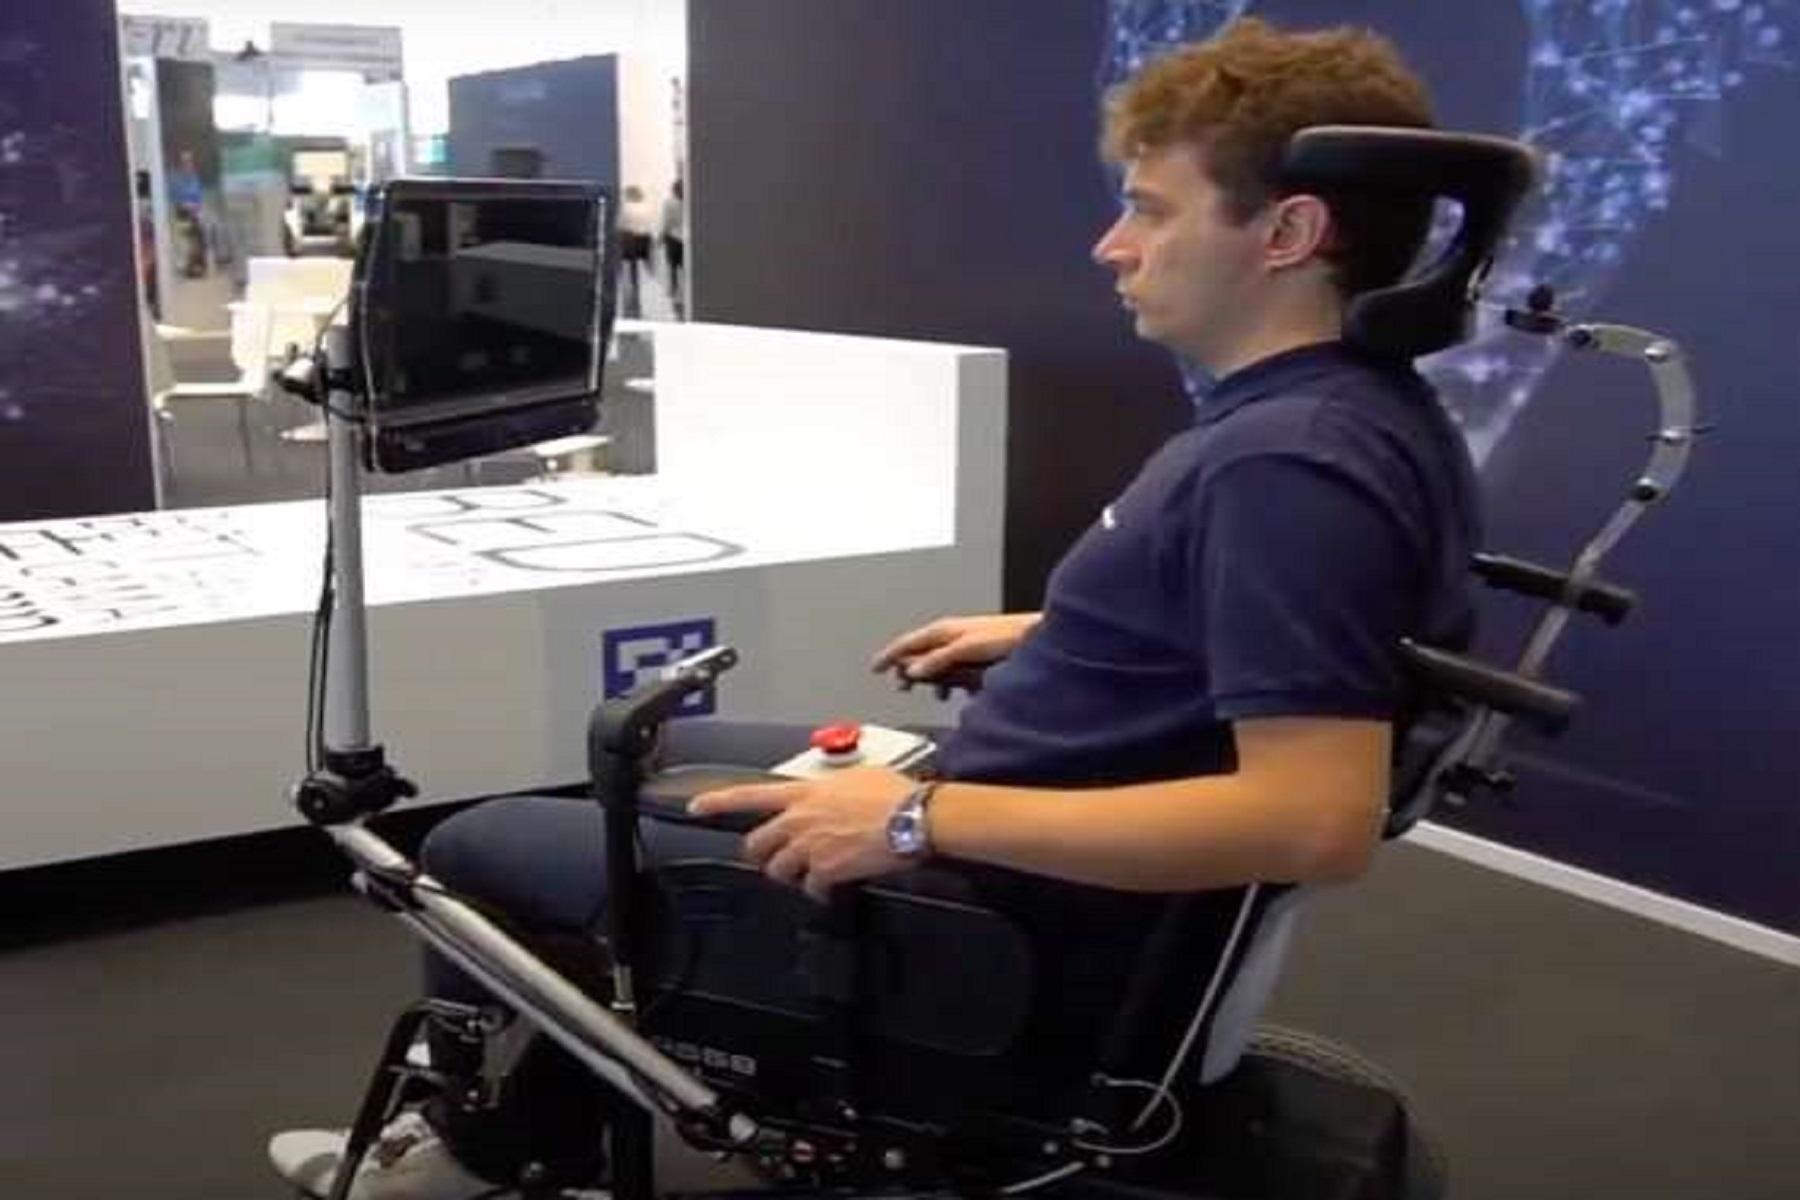 RoboEYE Παραπληγία: Ημιαυτόνομη αναπηρική καρέκλα με οδηγό το βλέμμα